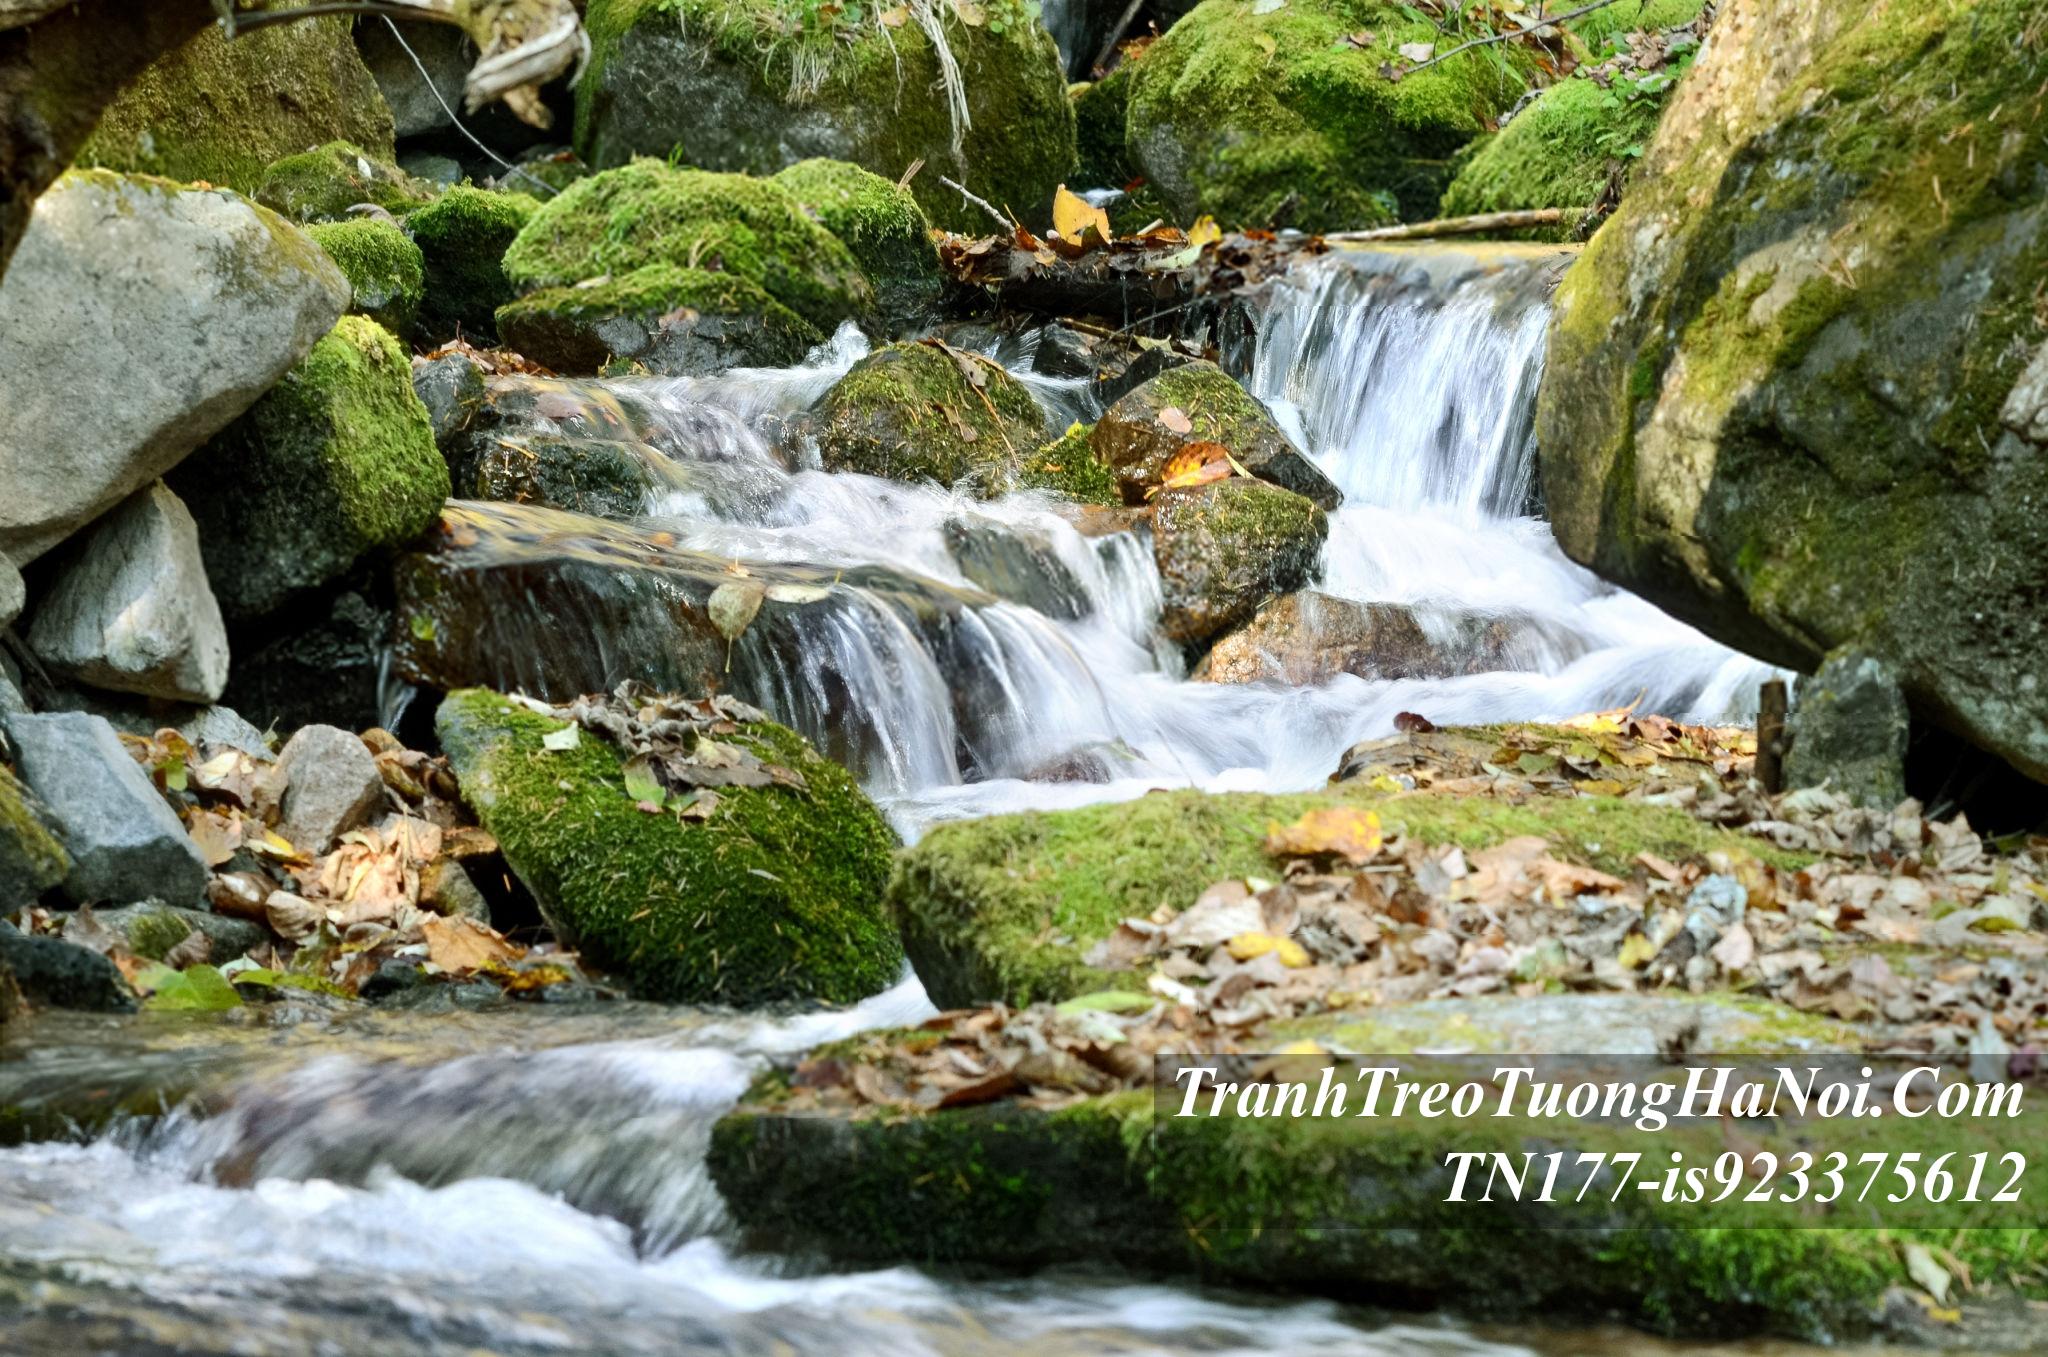 Tranh thac nuoc khe suoi amia TN177-is923375612